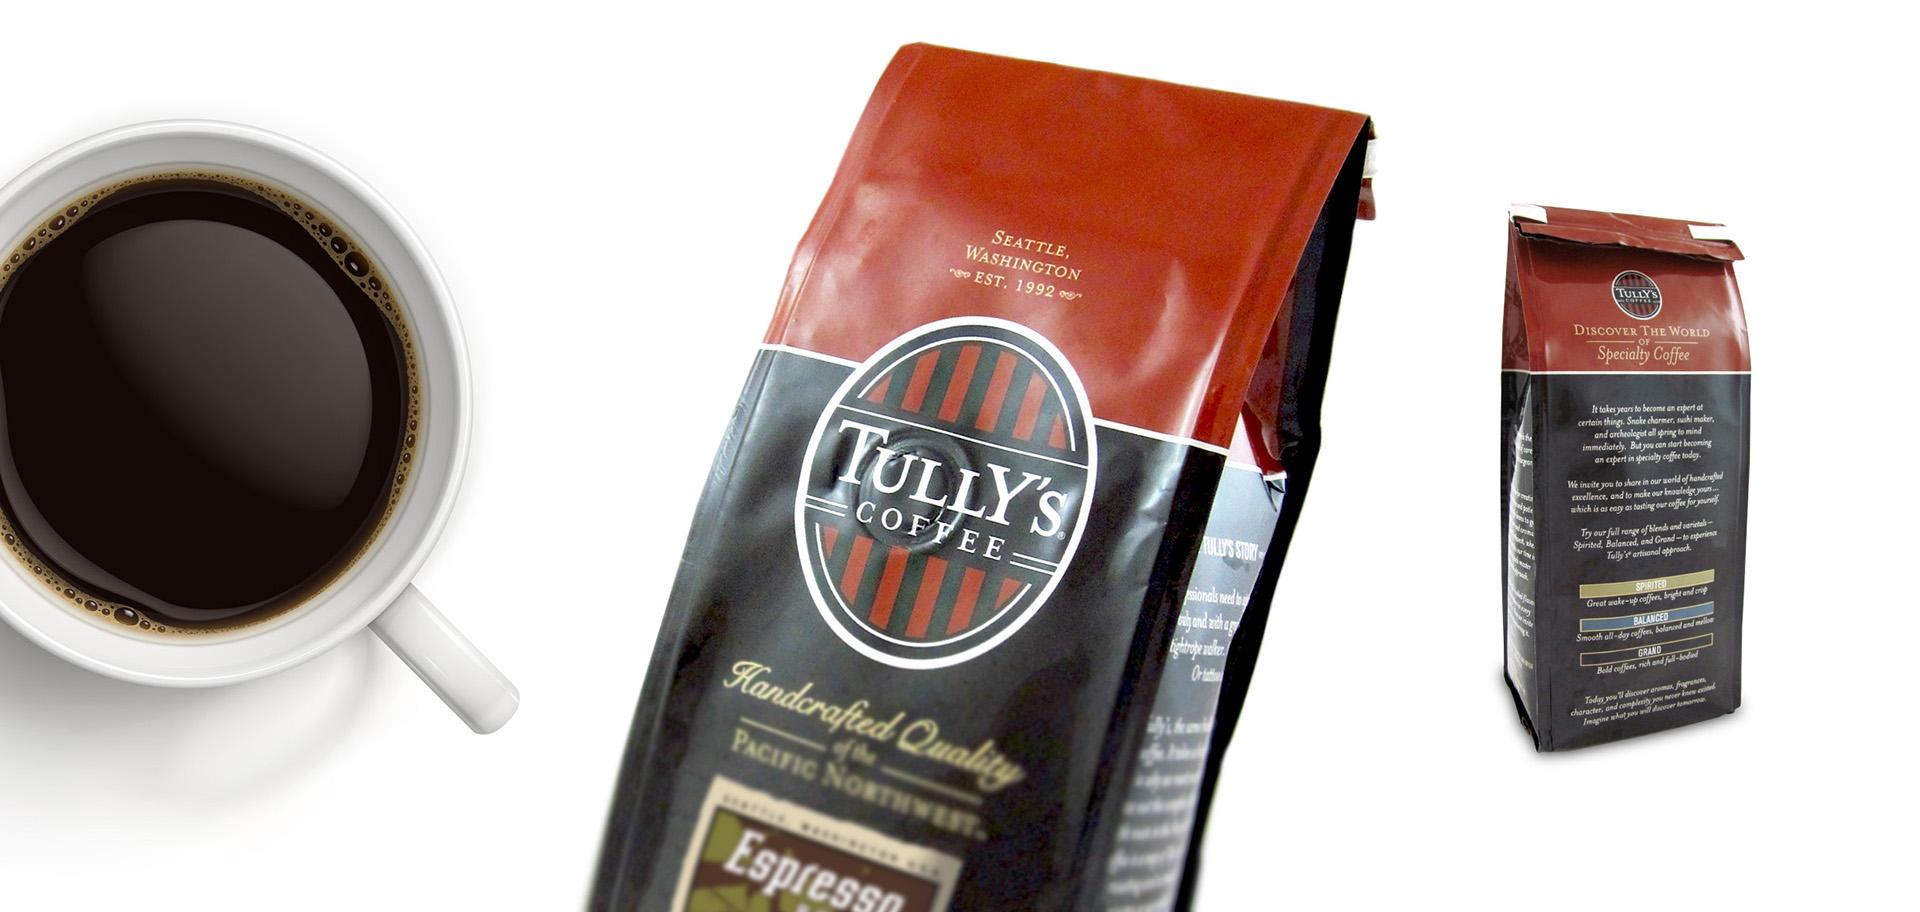 Tullys-4